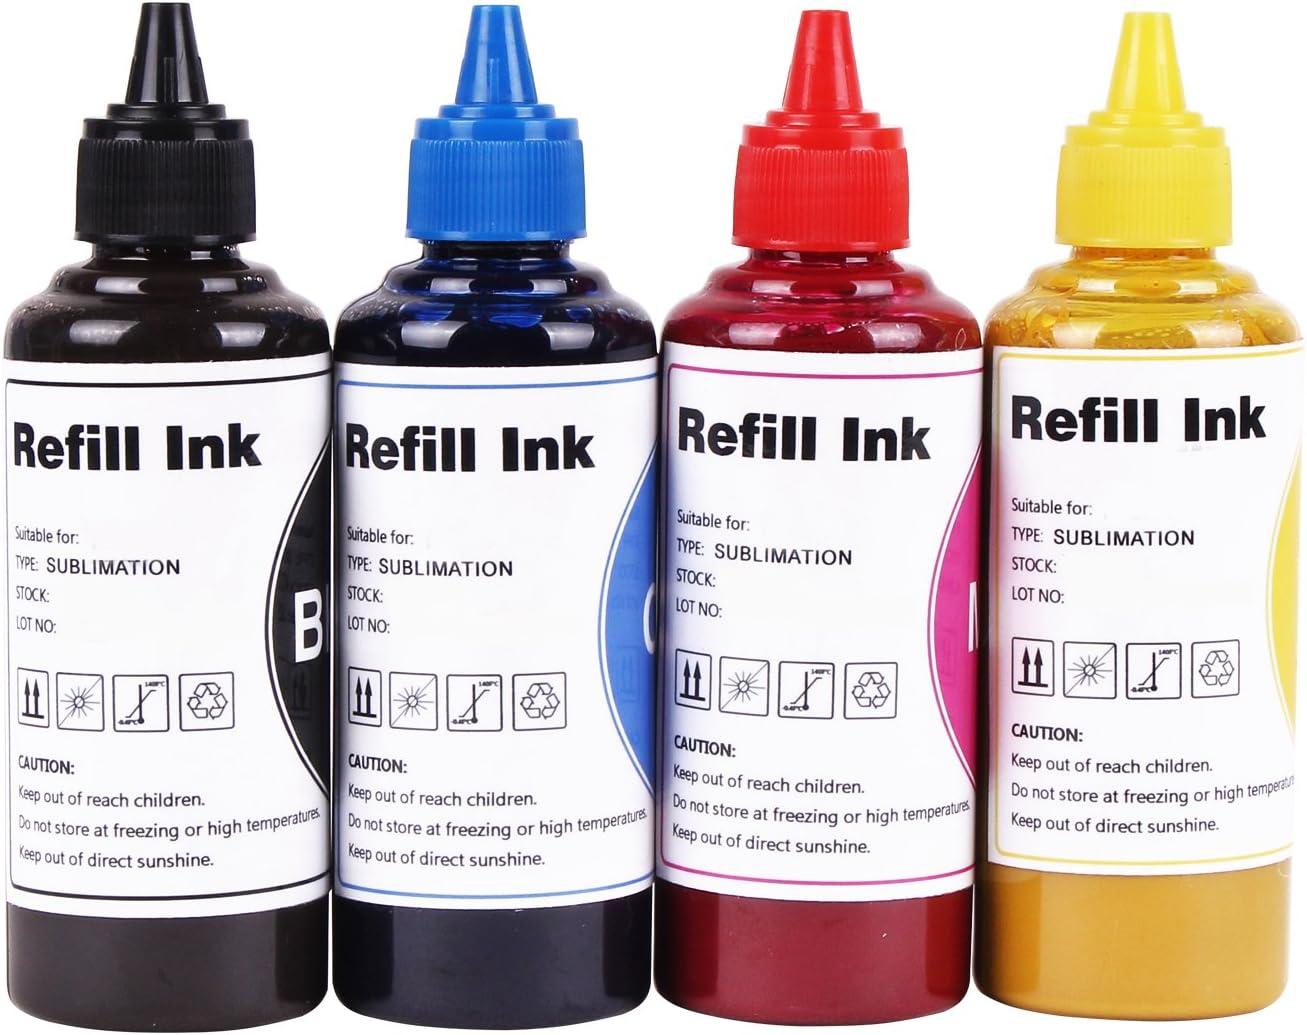 Dye hd Sublimation Ink for Inkjet Printers Refillable Ink Cartridge CISS for C88 C88+ WF7720 WF7710 WF7610 WF7510 WF7010 WF3610 WF3540 WF2760 WF2630 CX3800 ET-2650